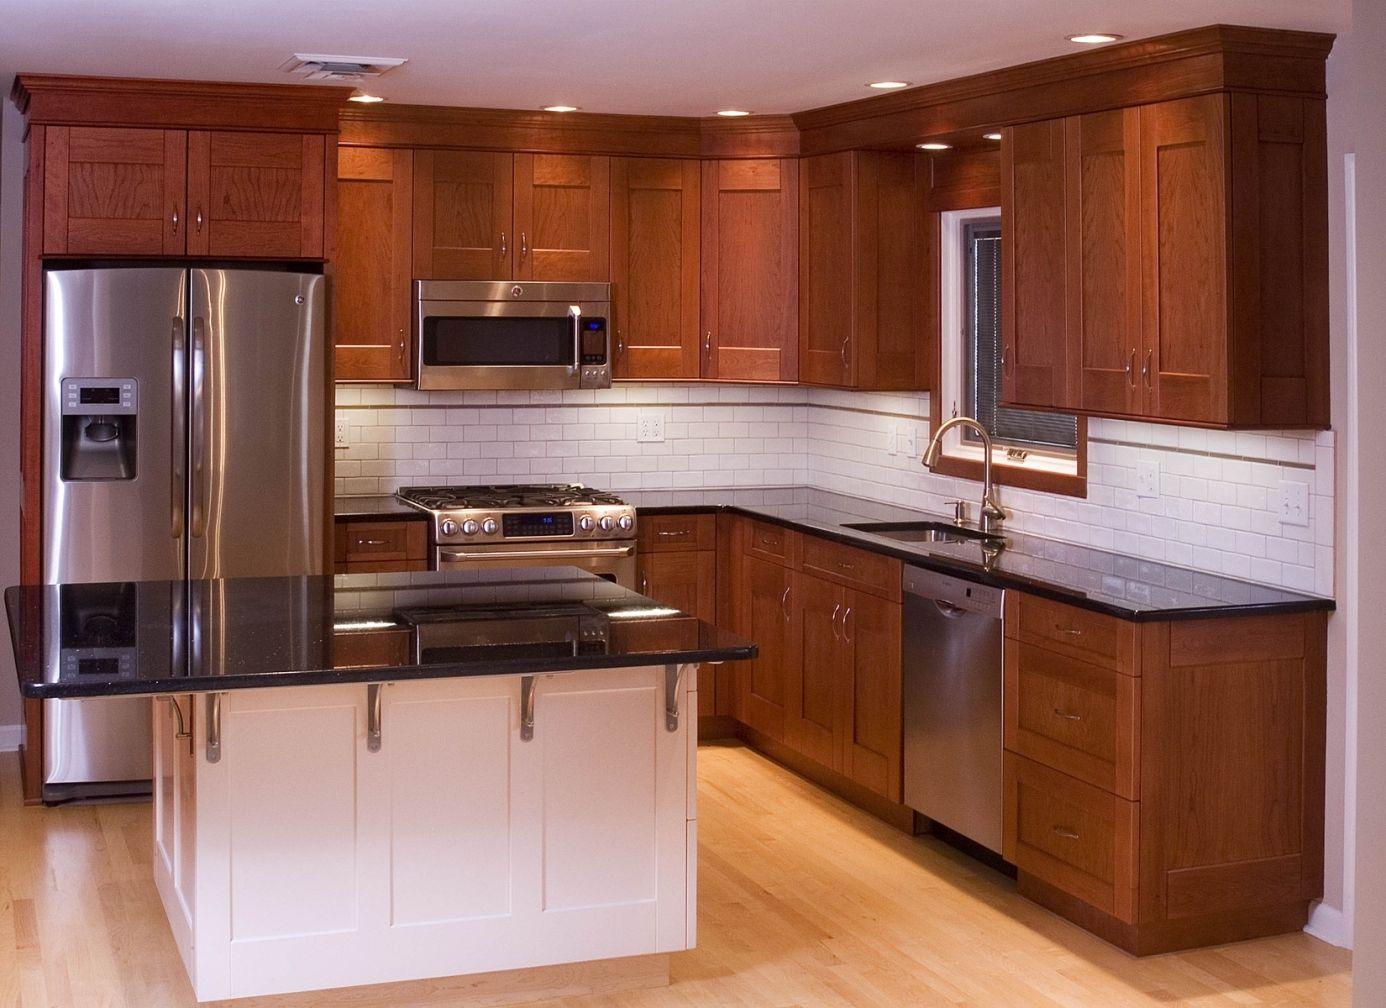 Cherry kitchen cabinets remodeling ideas pinterest cherry